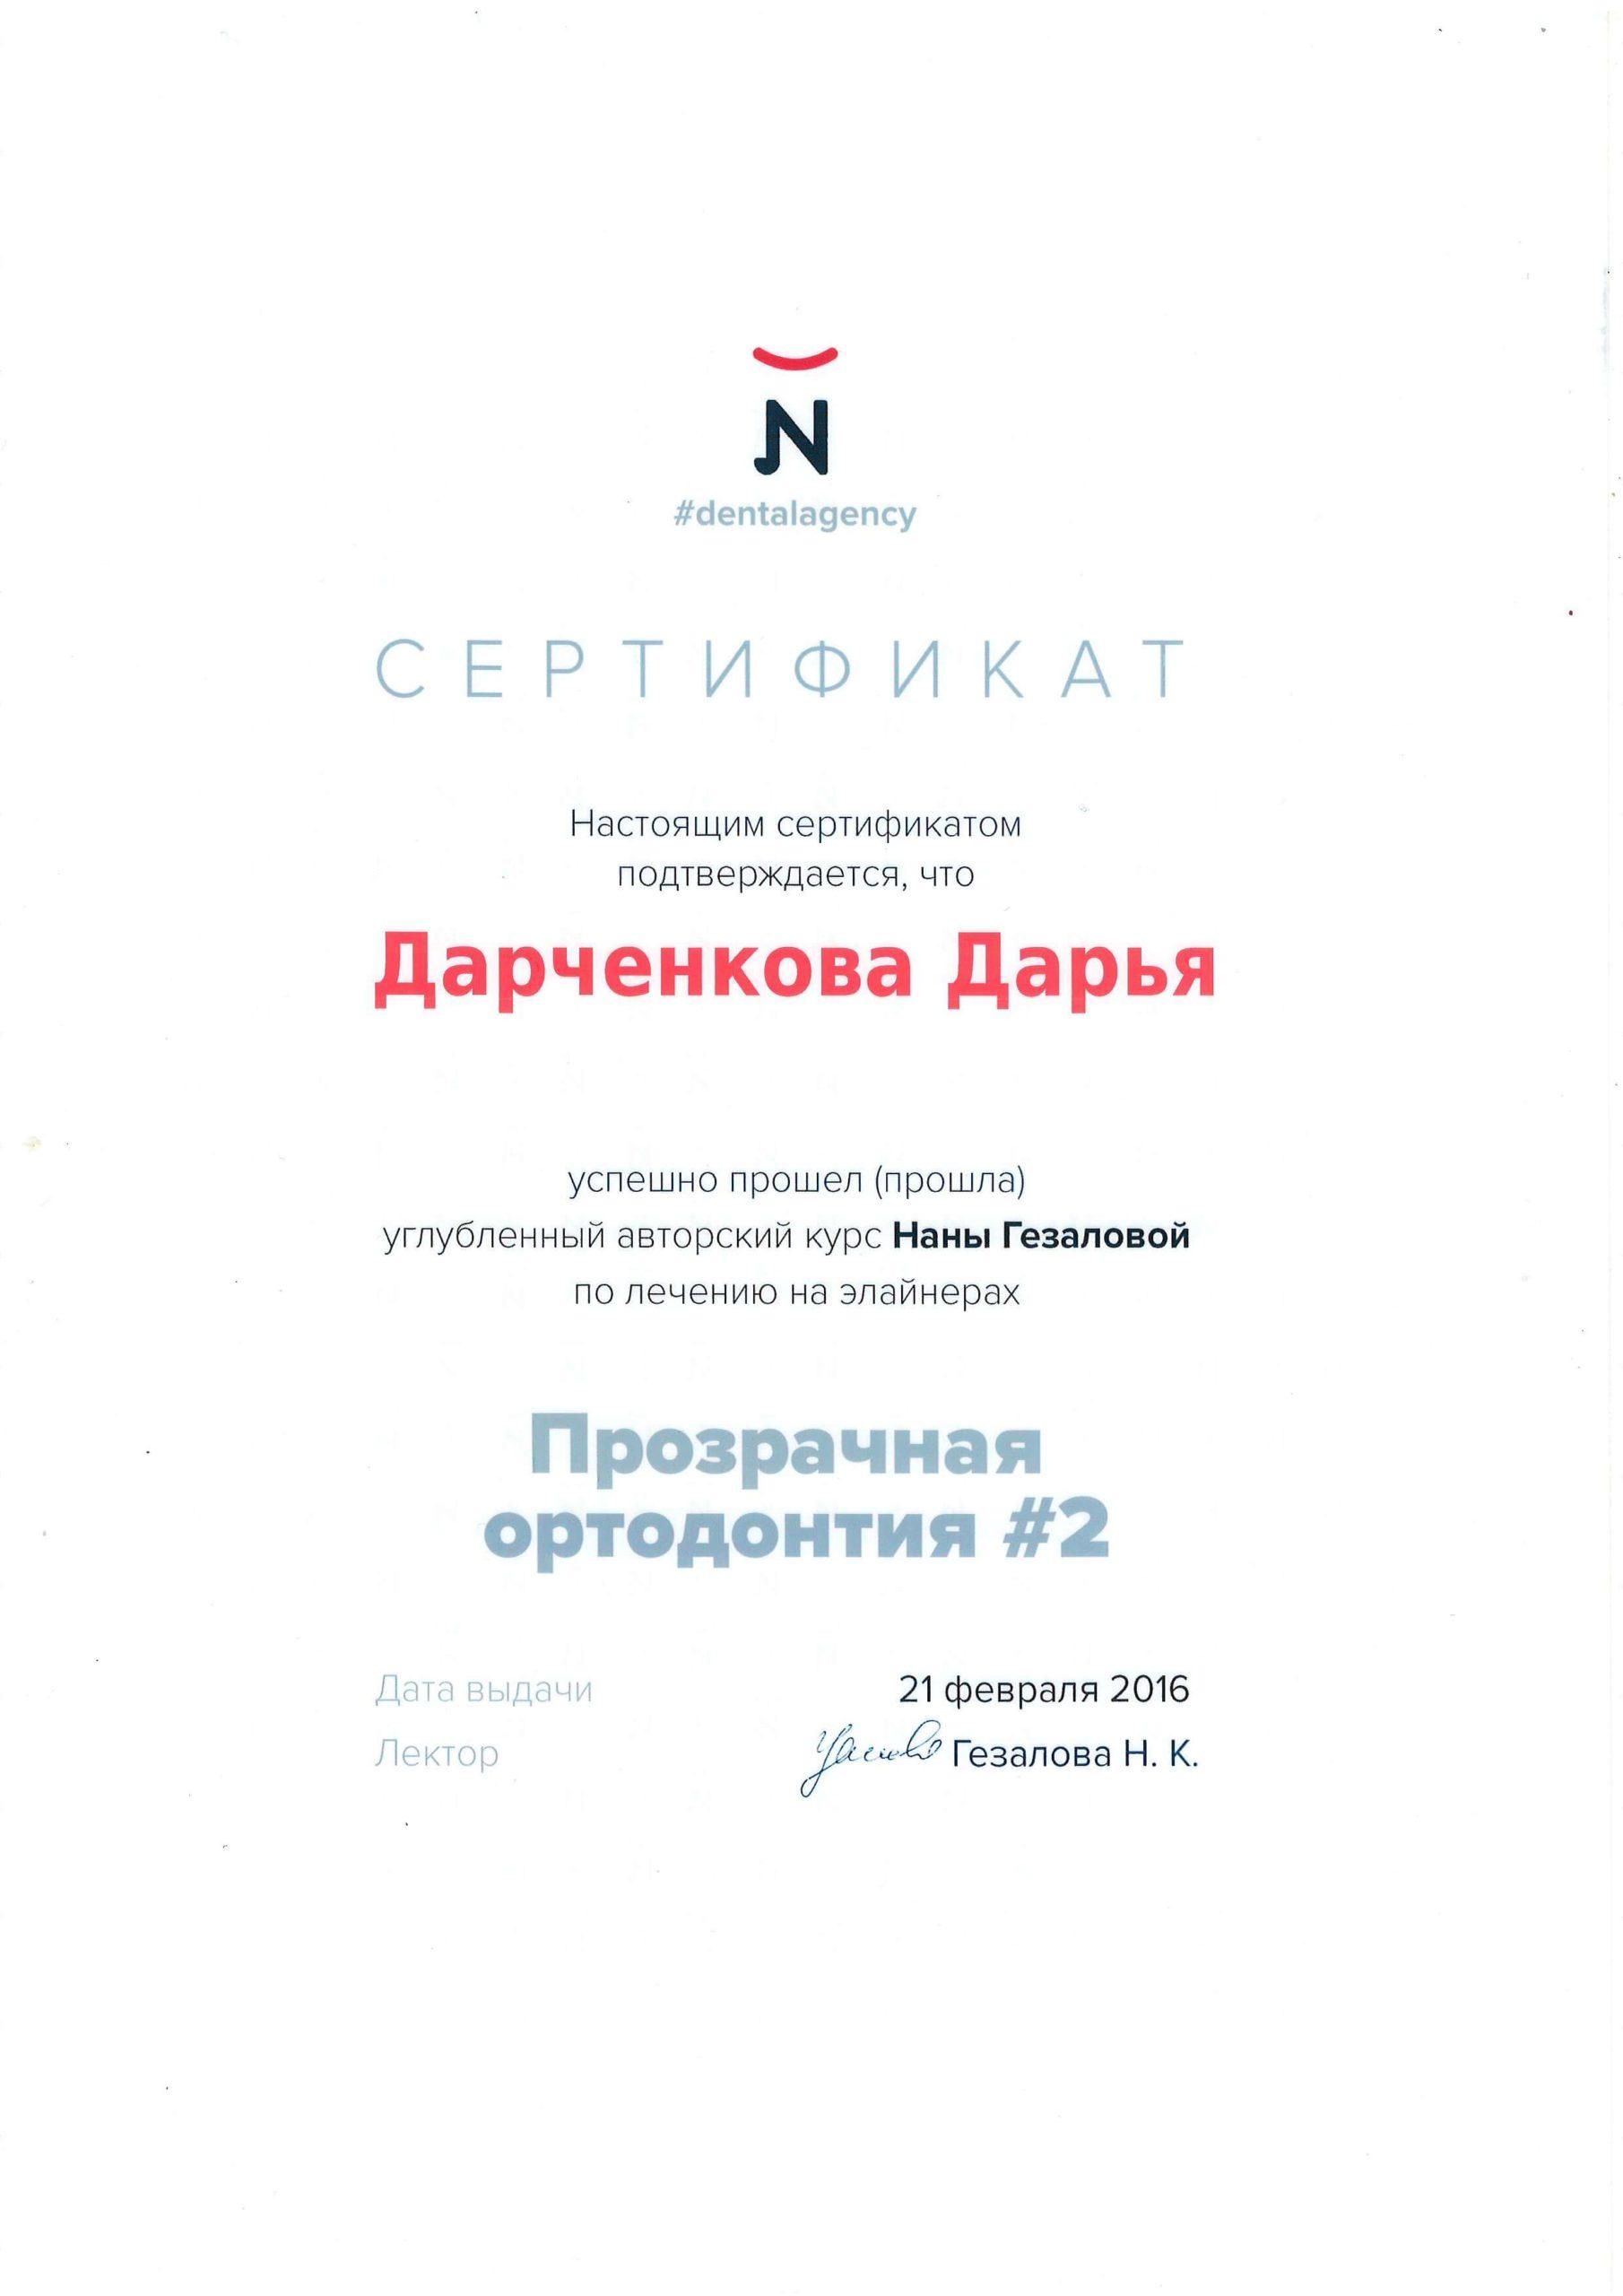 сертификат стоматолога Дарченкова февраль 2016